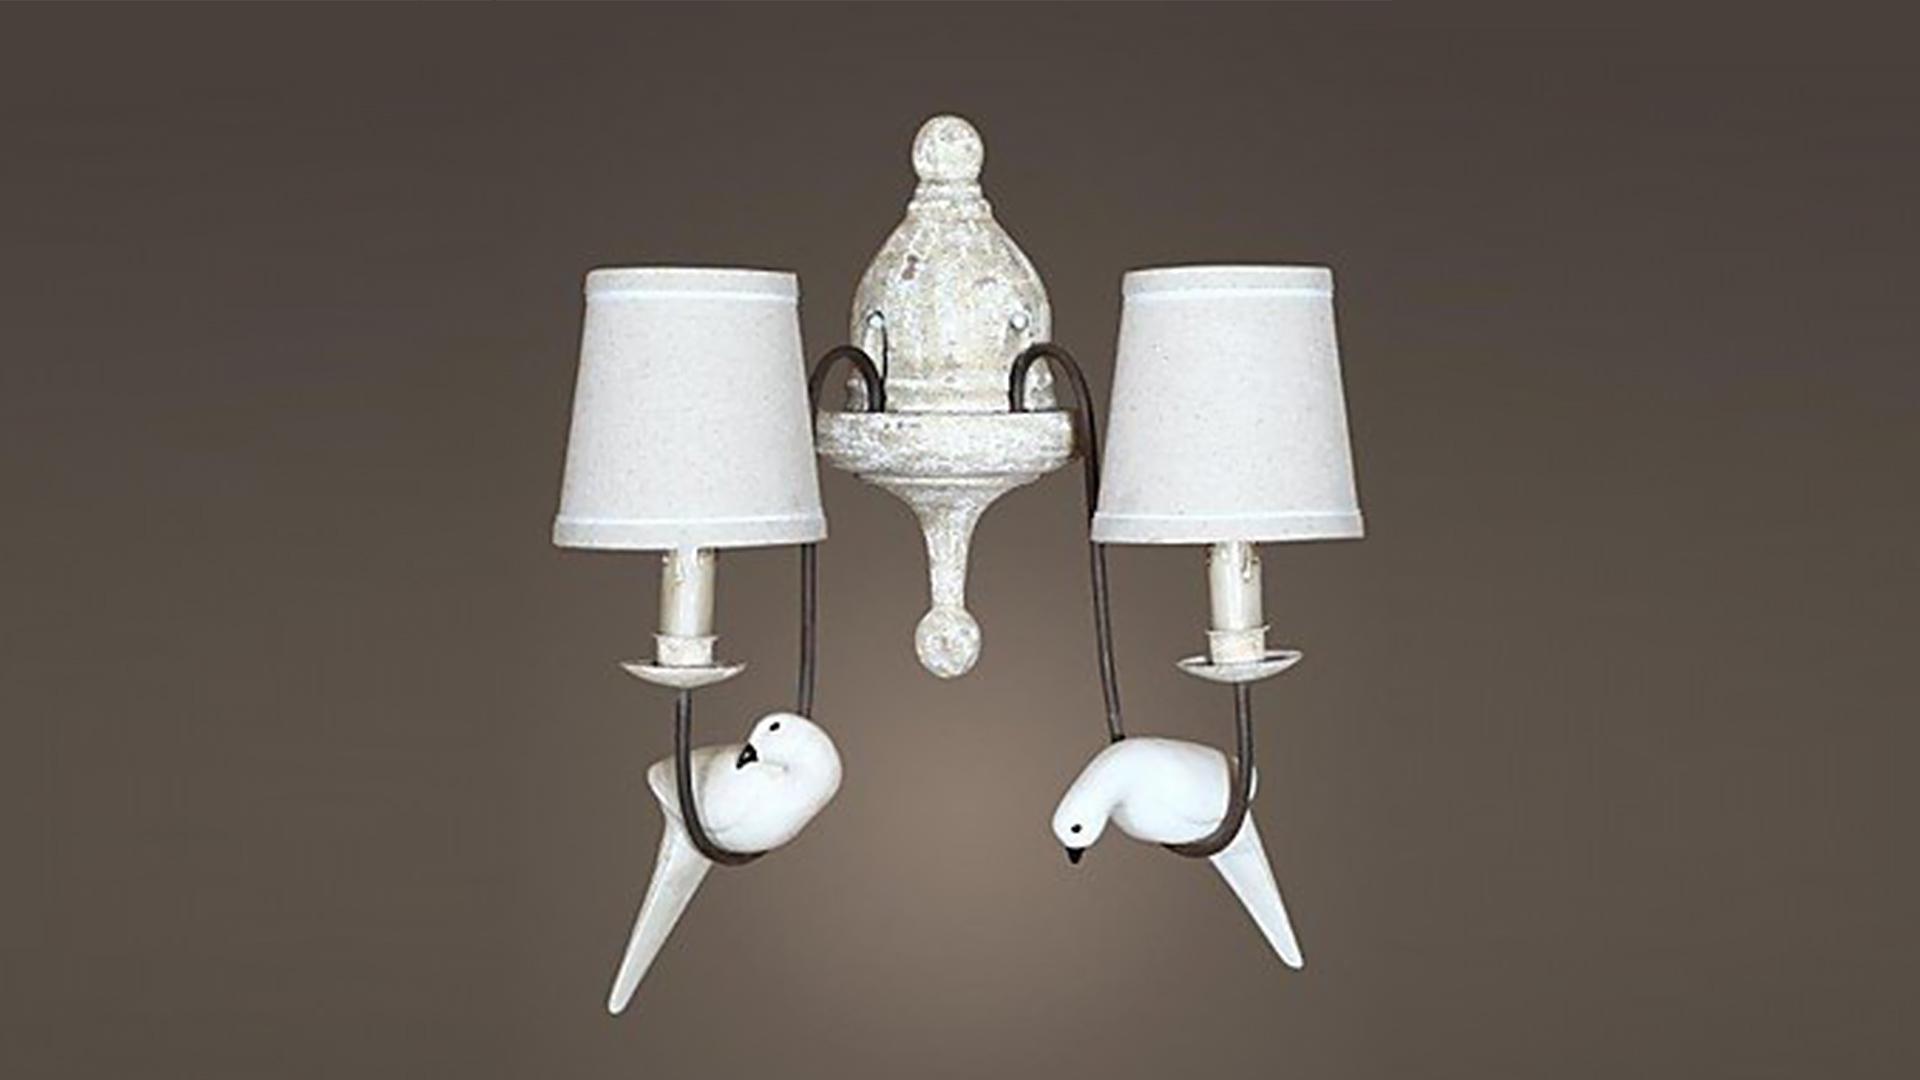 Traditional Bird Lamp - Big Brother 2017